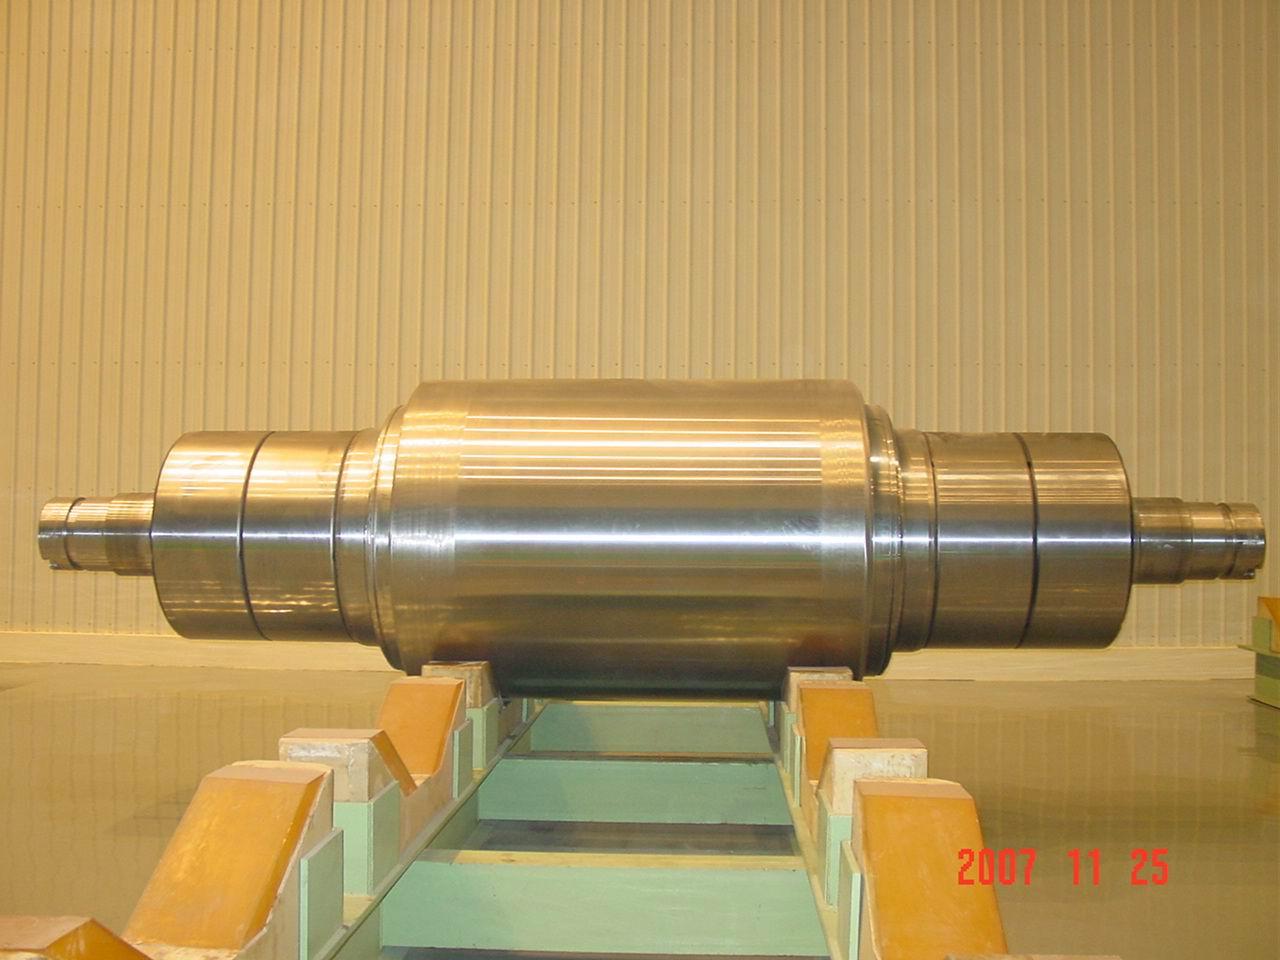 Mill Roll